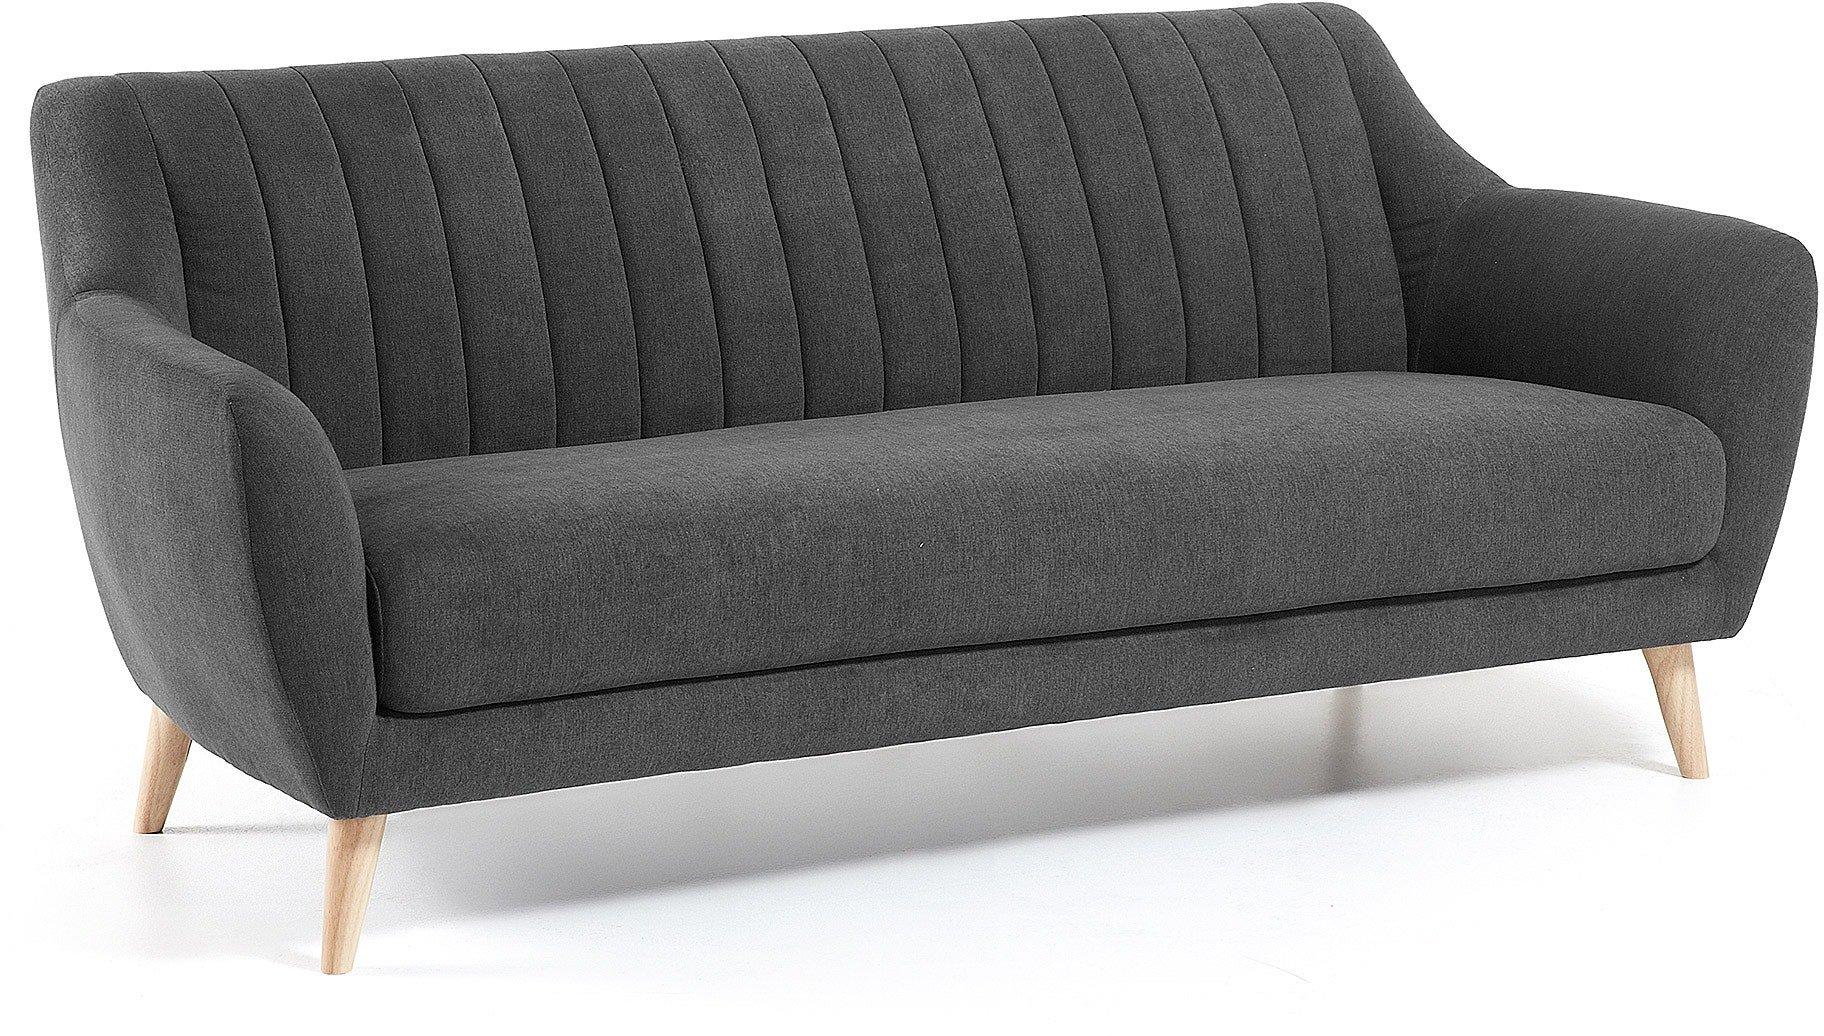 Obo, 3-personers sofa by LaForma (H: 81 cm. B: 190 cm. L: 81 cm., Grå/Natur)